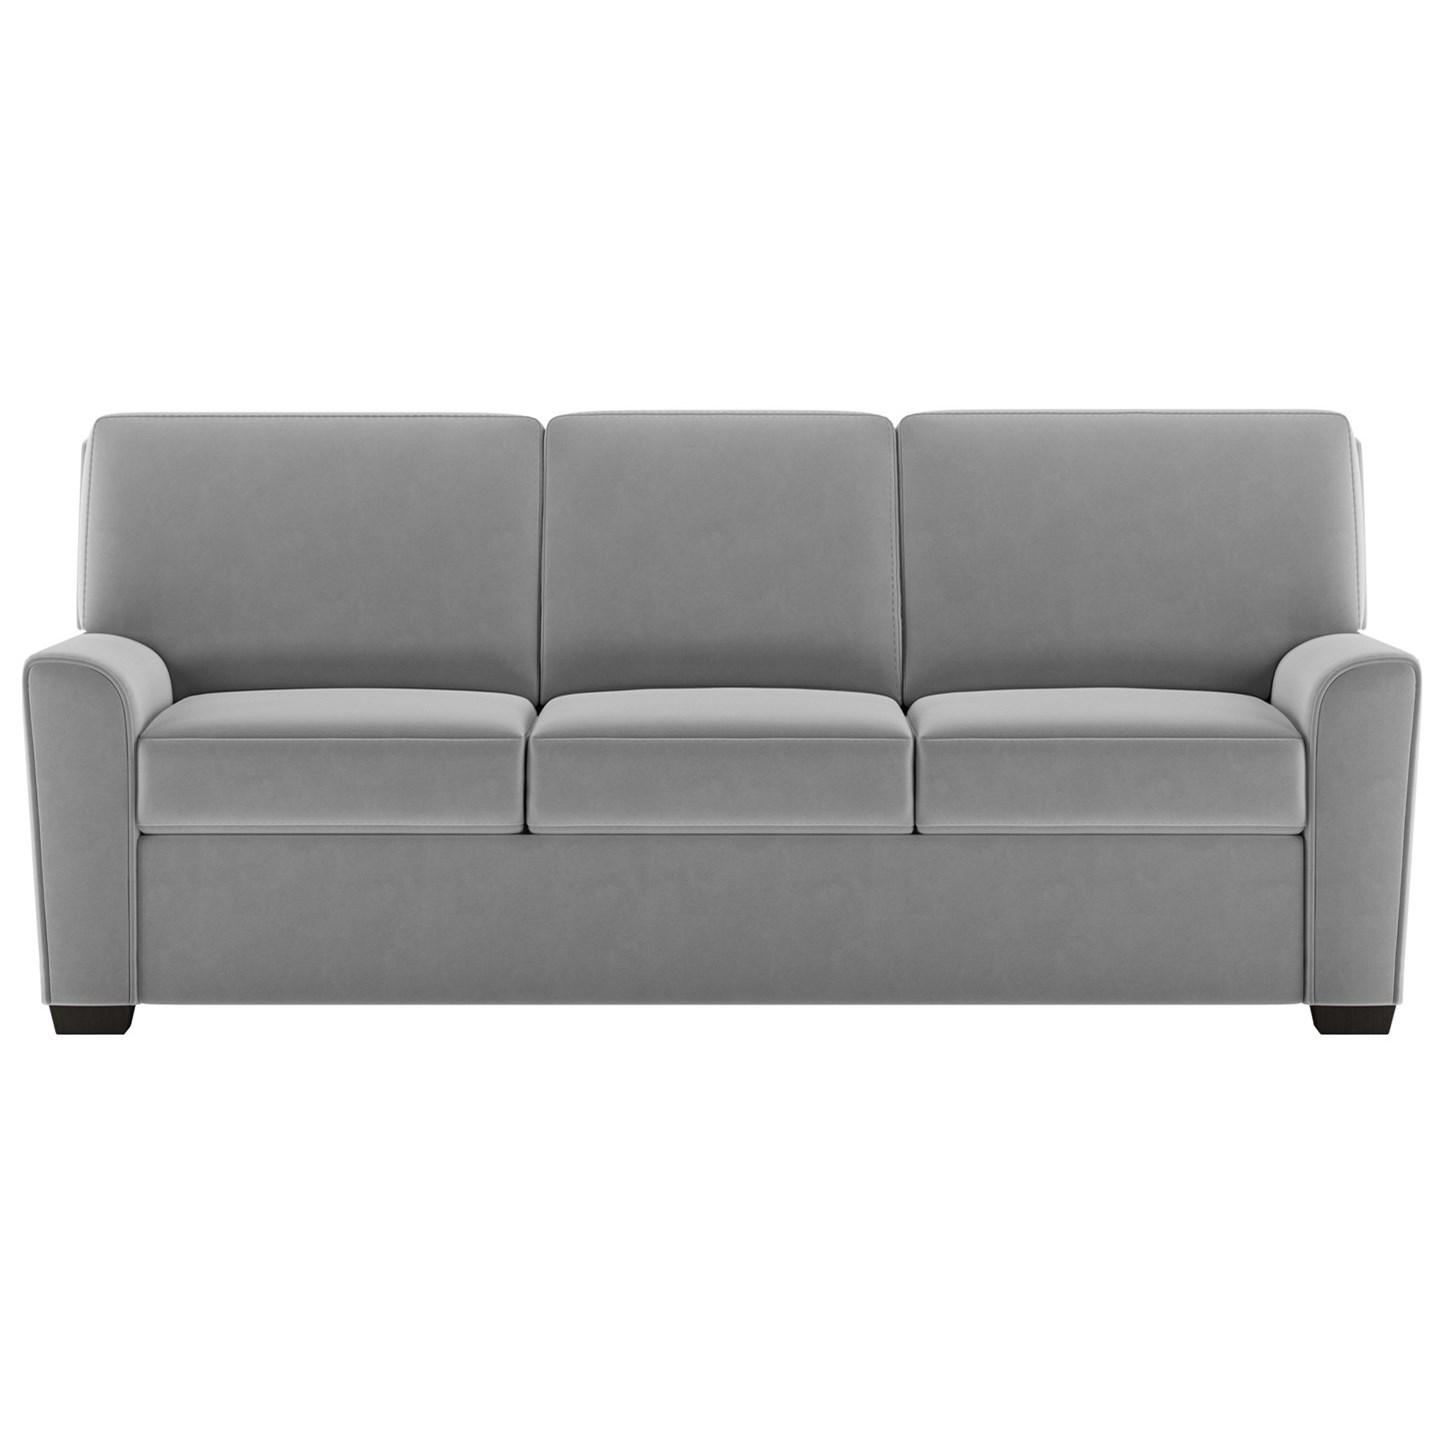 Pleasant American Leather Klein King Size Comfort Sleeper Sofa Frankydiablos Diy Chair Ideas Frankydiabloscom